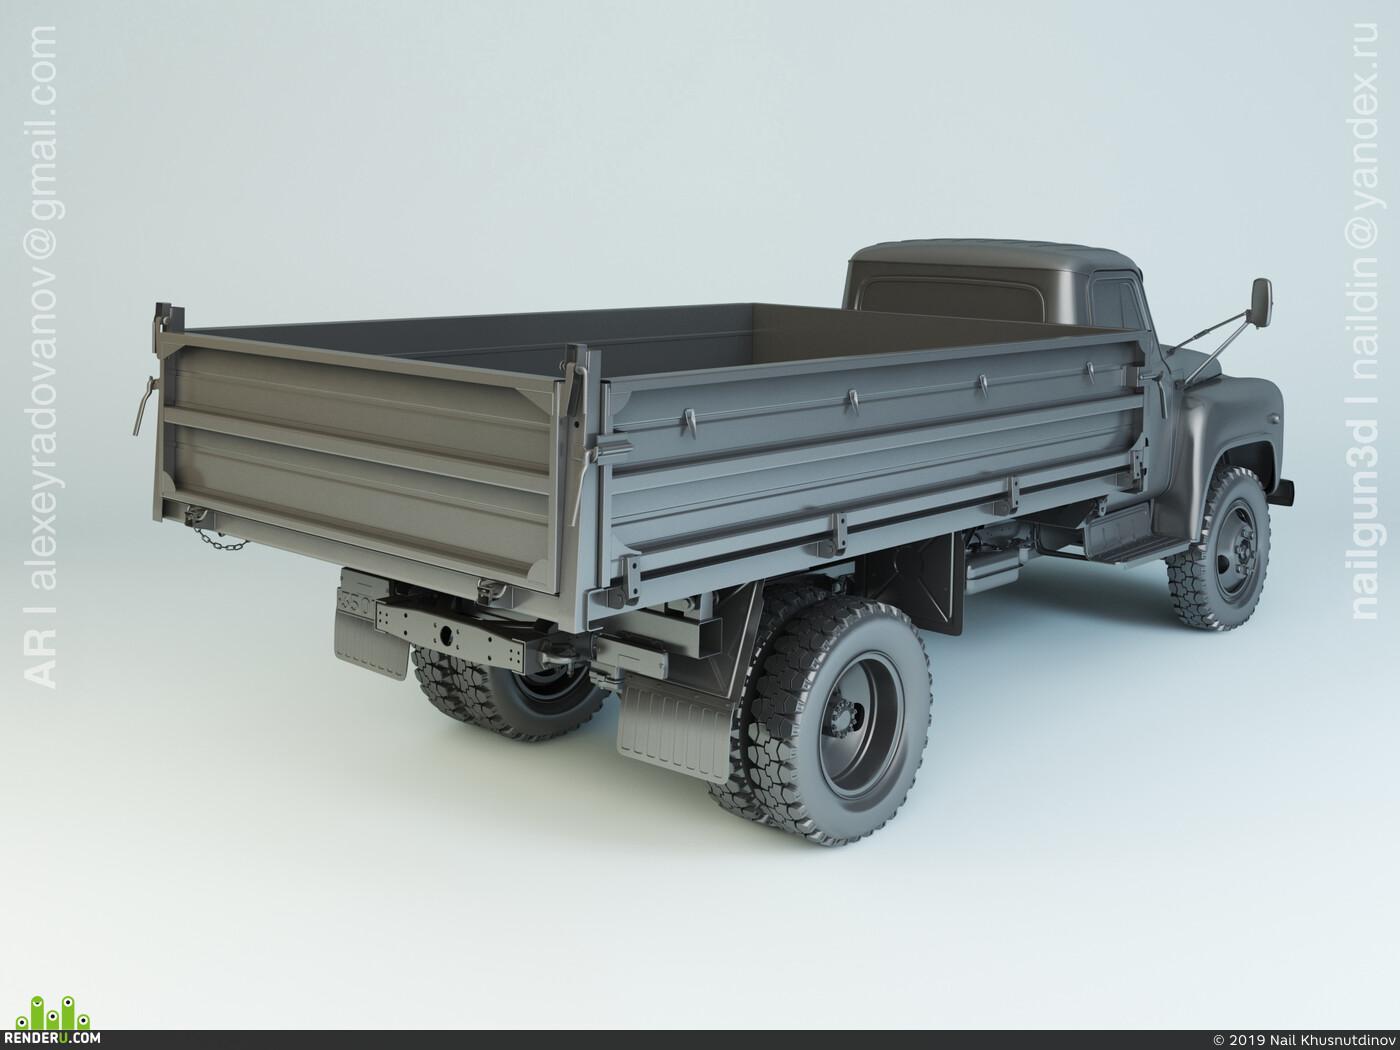 самосвал, газ, САЗ, грузовик, газон, ссср